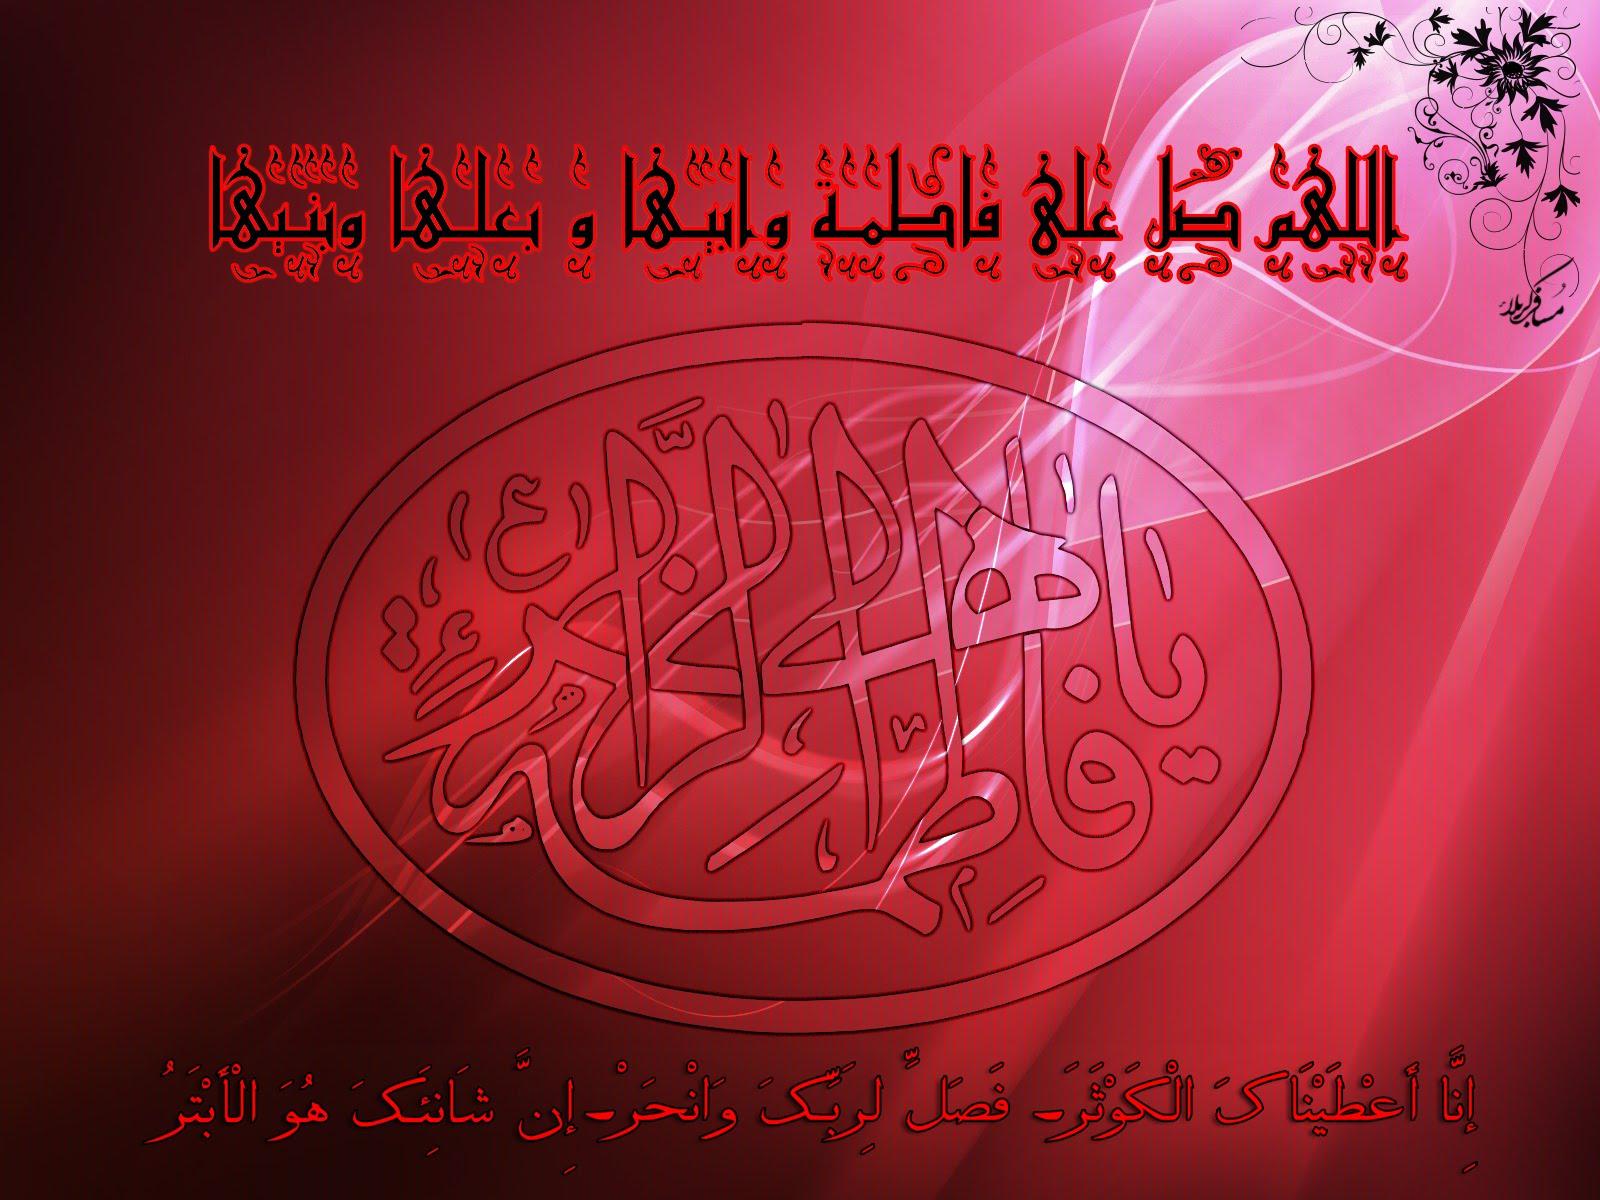 Haiderium Wallpapers Hazrat Fatima Zahra Sa Red